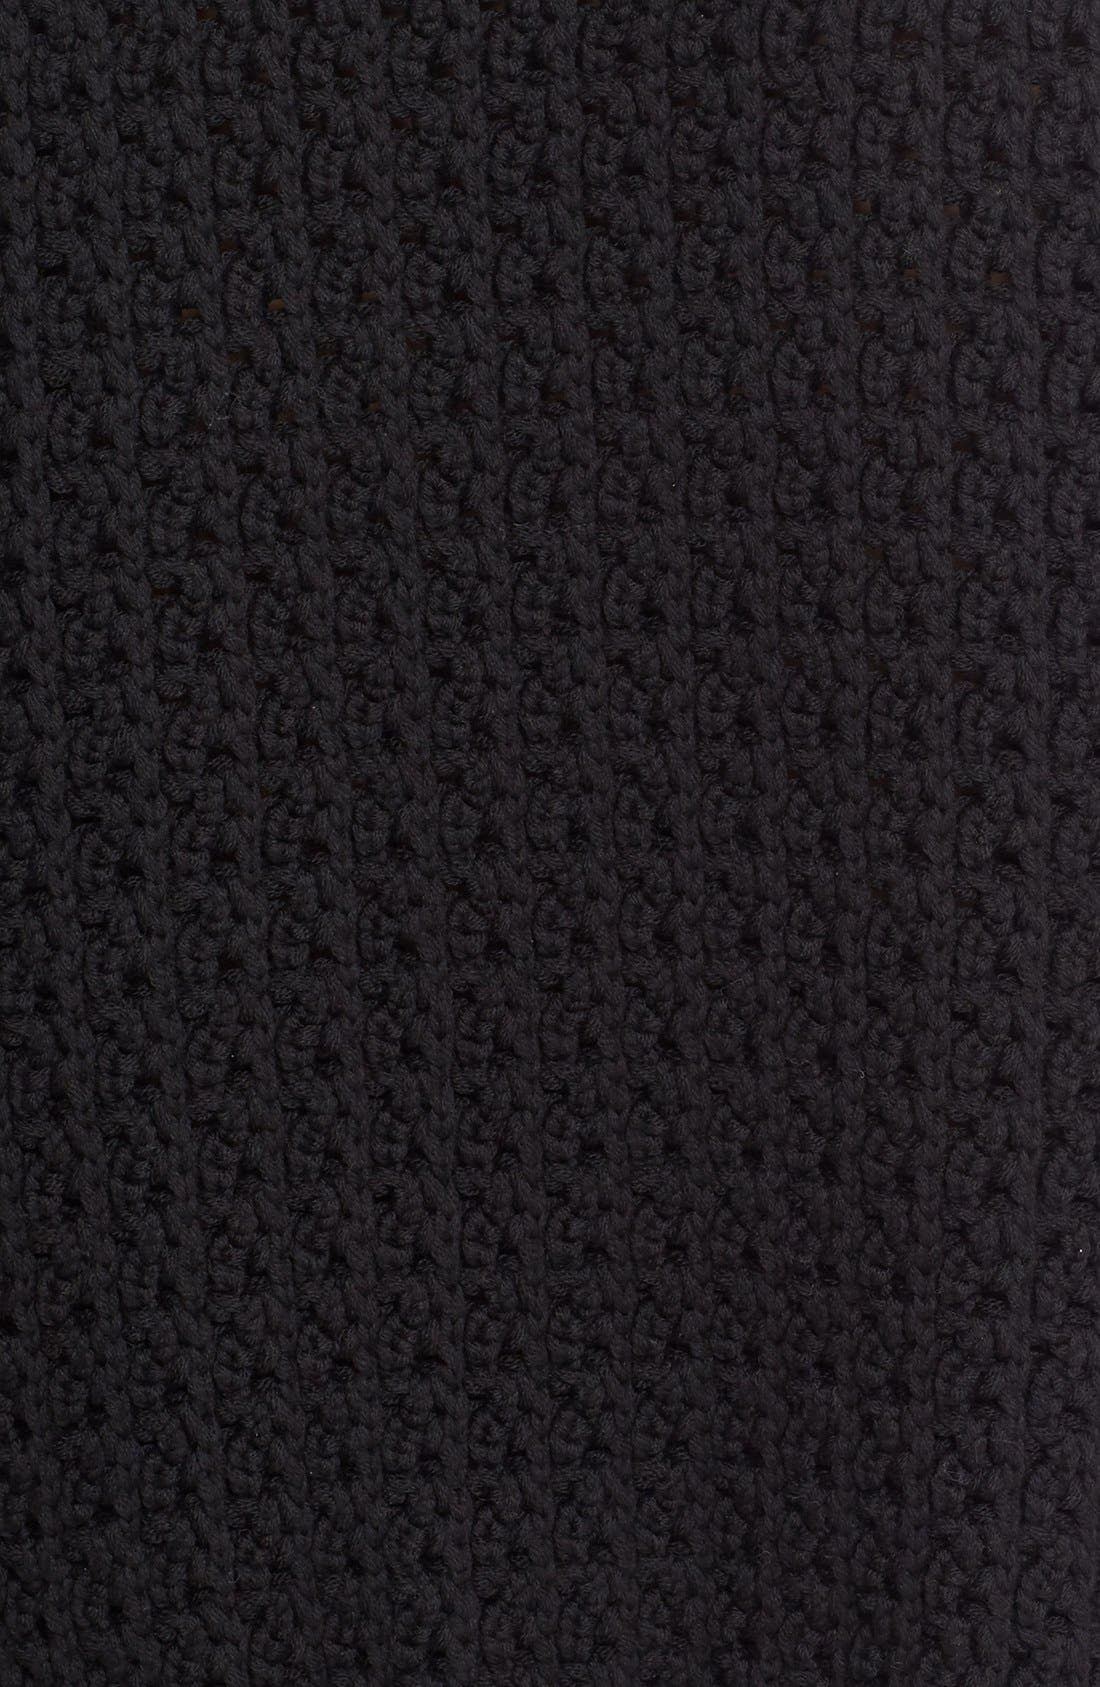 Alternate Image 3  - Simone Rocha Long Chunky Knit Wool Sweater with Fringe